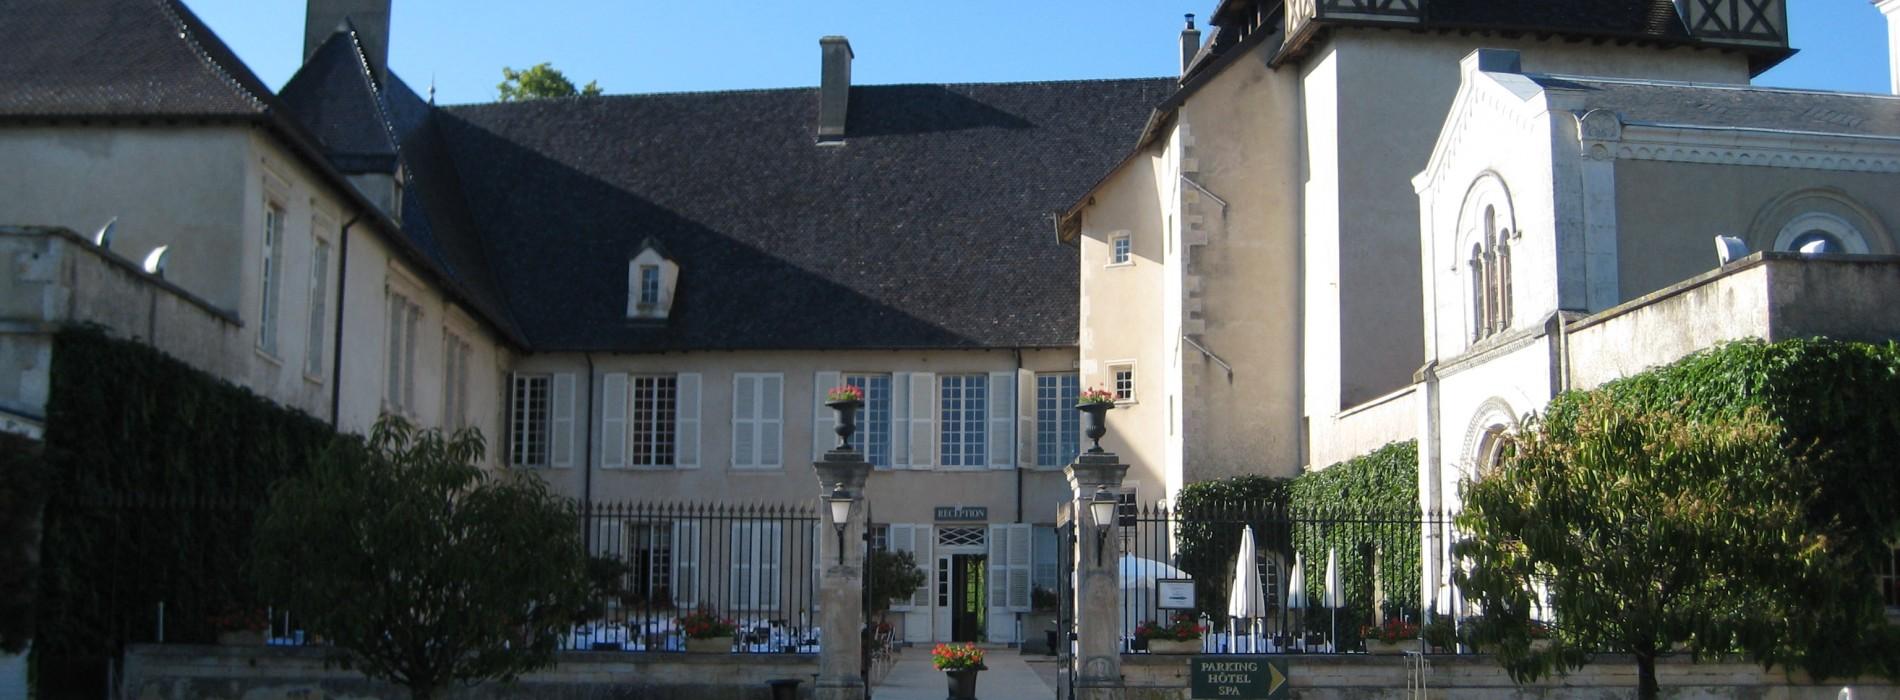 PIzay Chateau